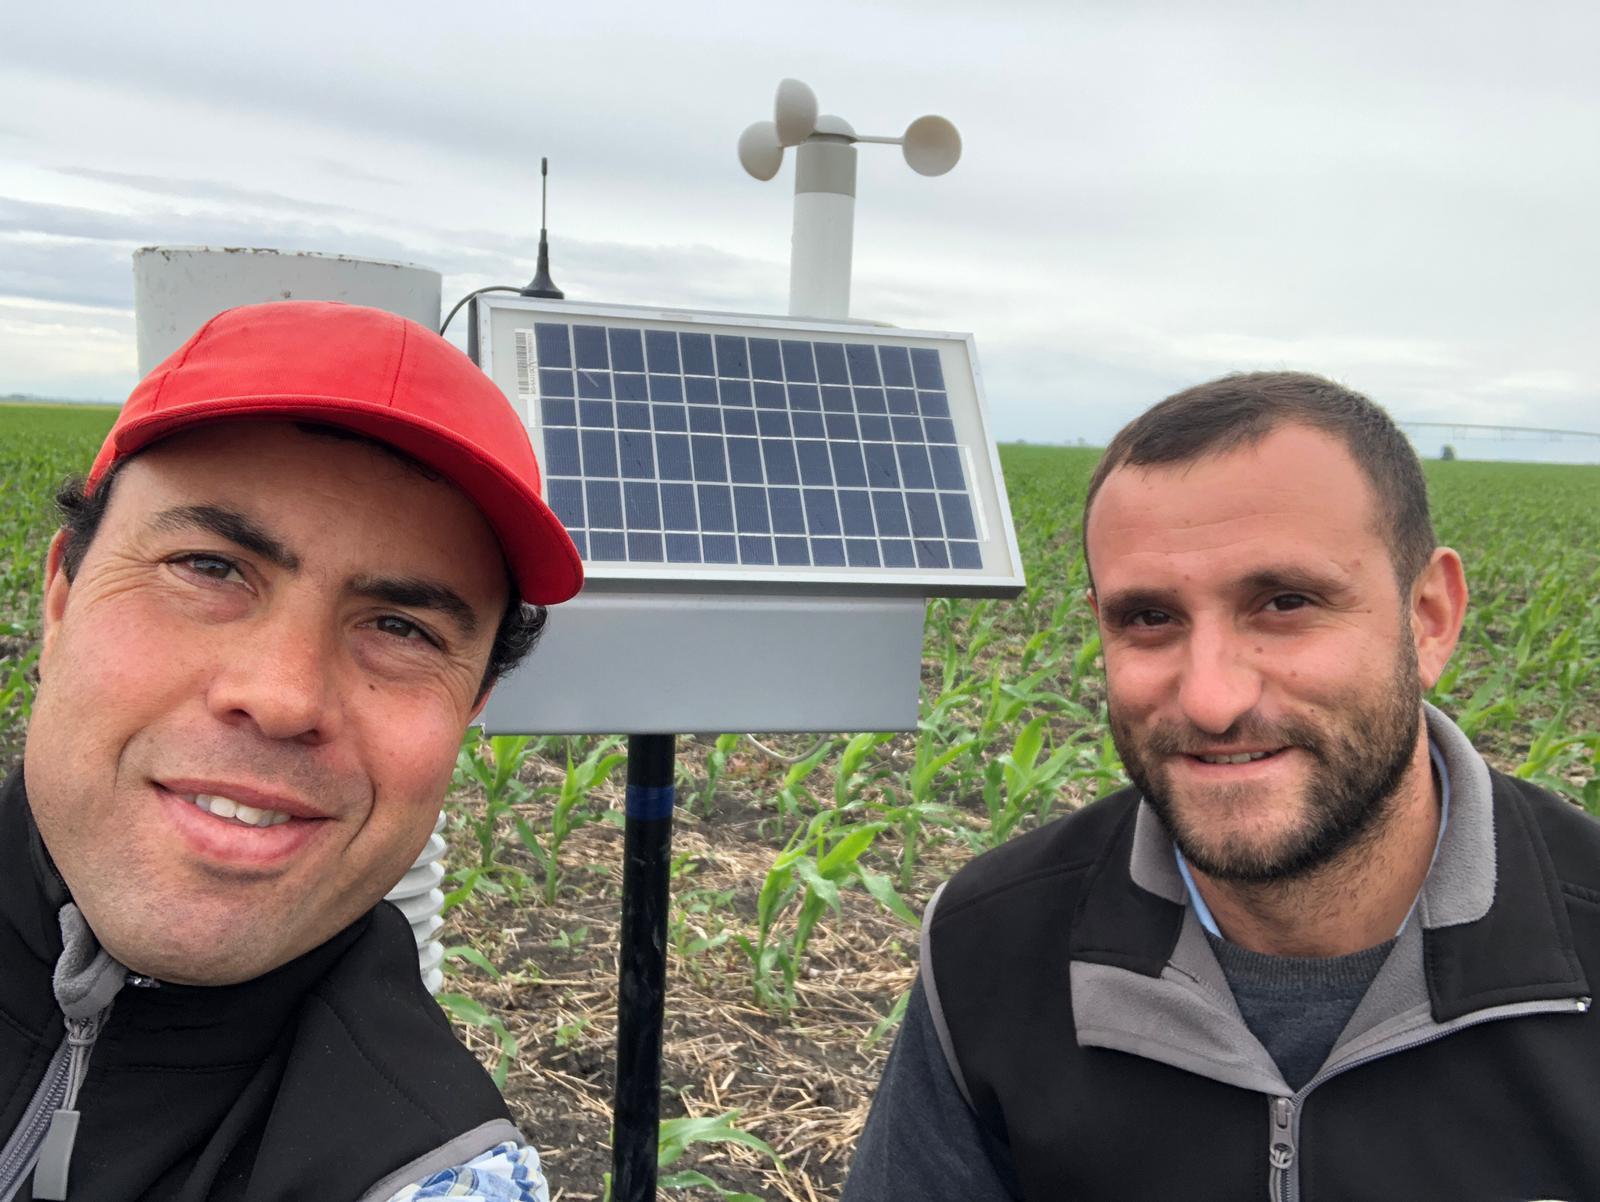 Interview Series: The Farmer Impact.